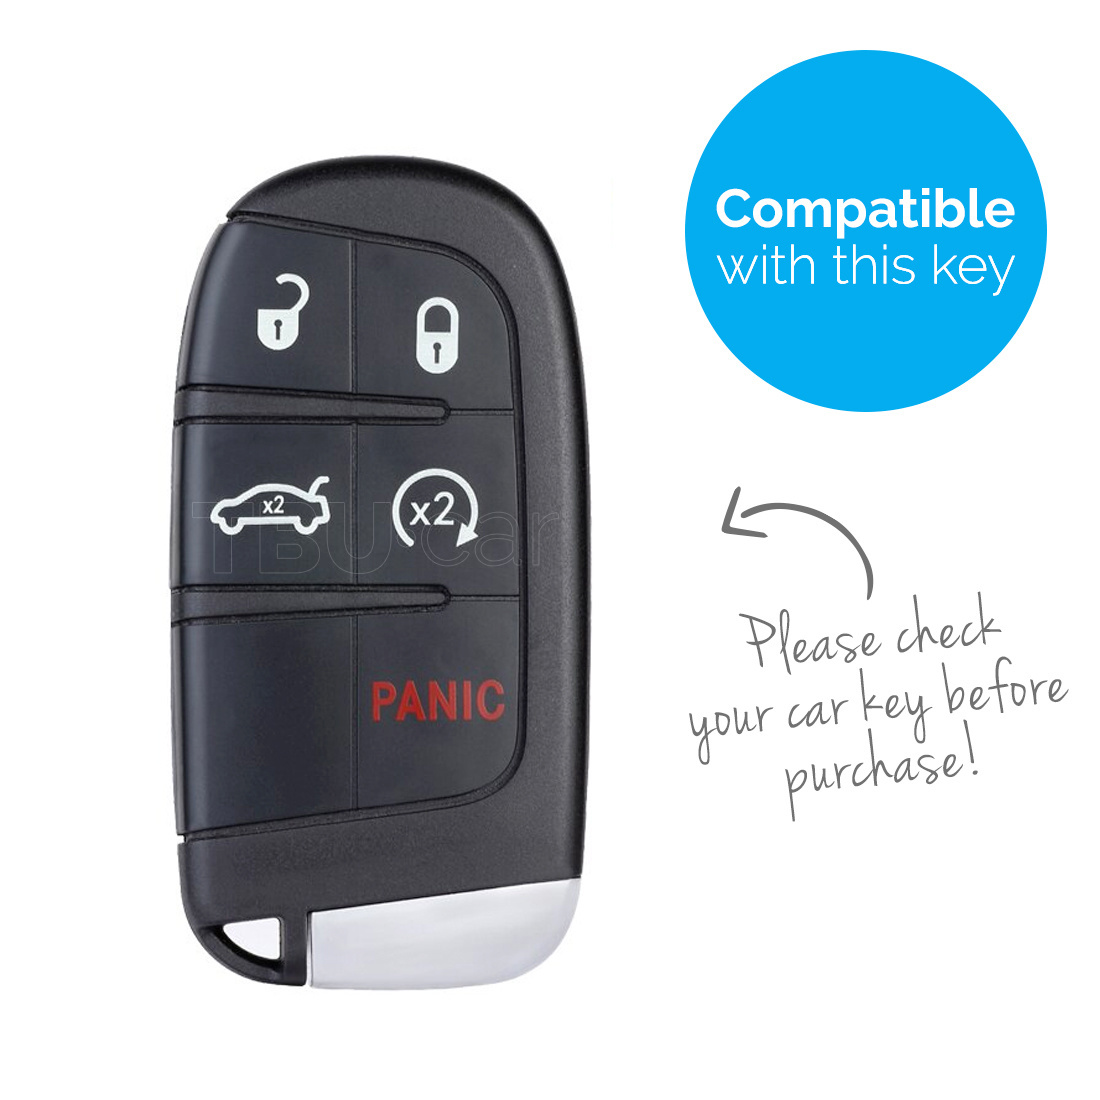 TBU car TBU car Sleutel cover compatibel met Jeep - Silicone sleutelhoesje - beschermhoesje autosleutel - Blauw